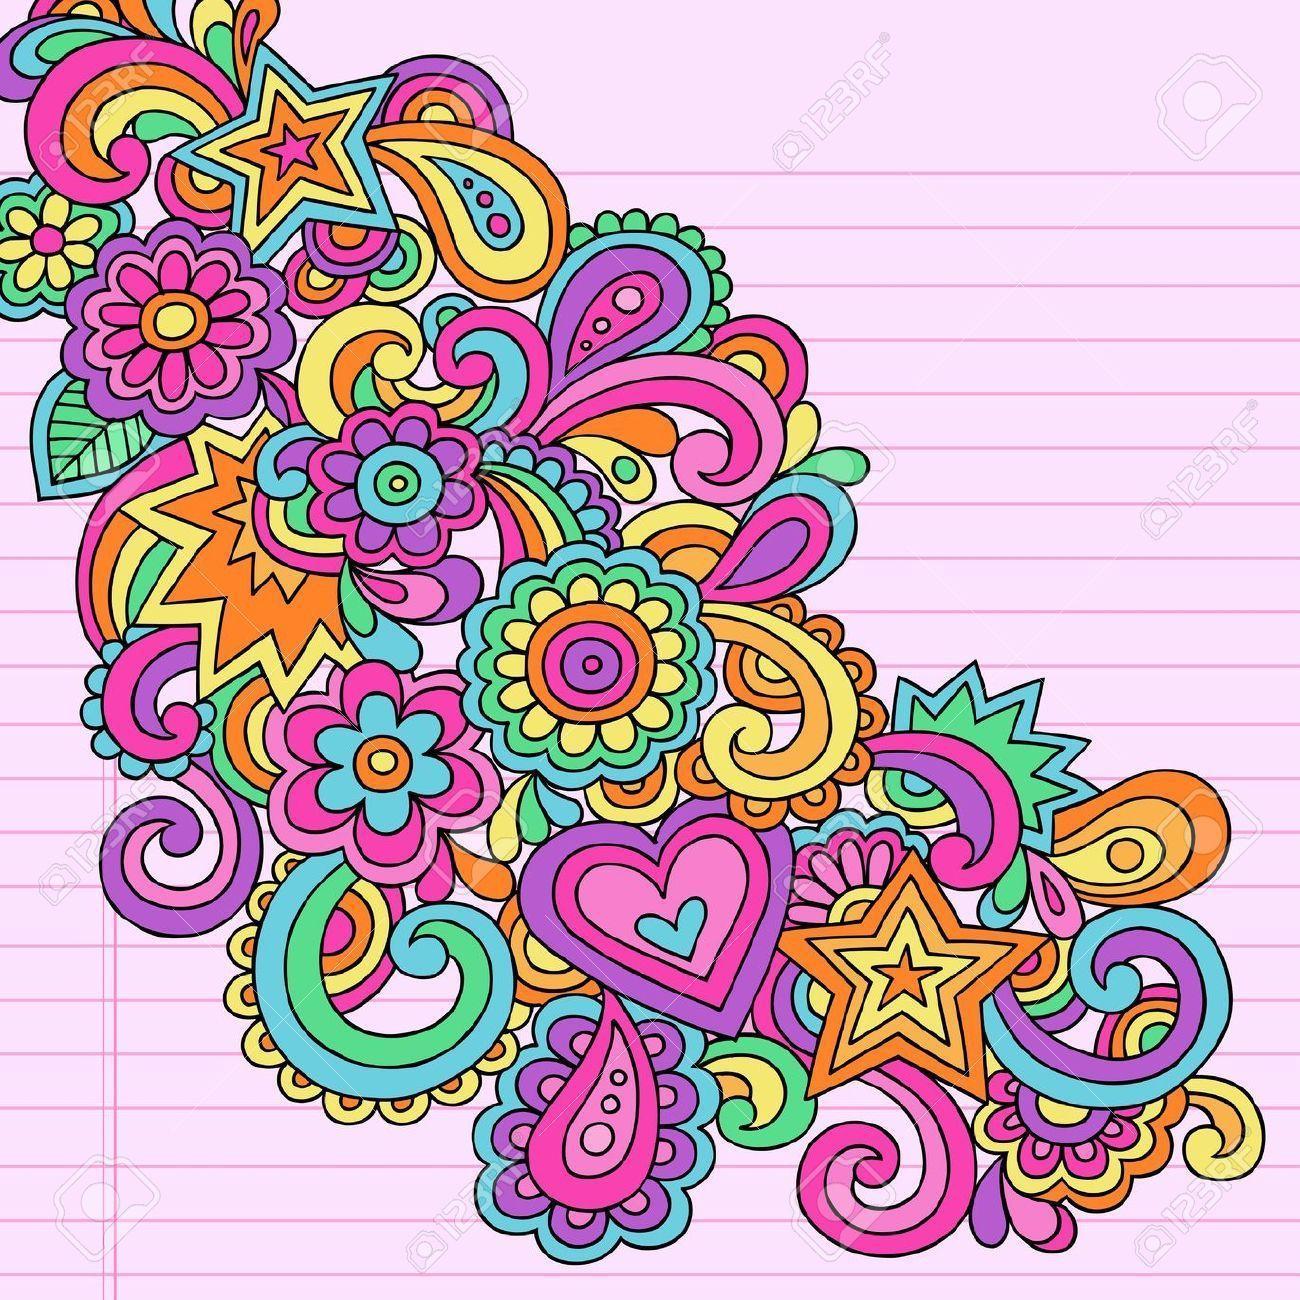 Hippie Flower Wallpapers Top Free Hippie Flower Backgrounds